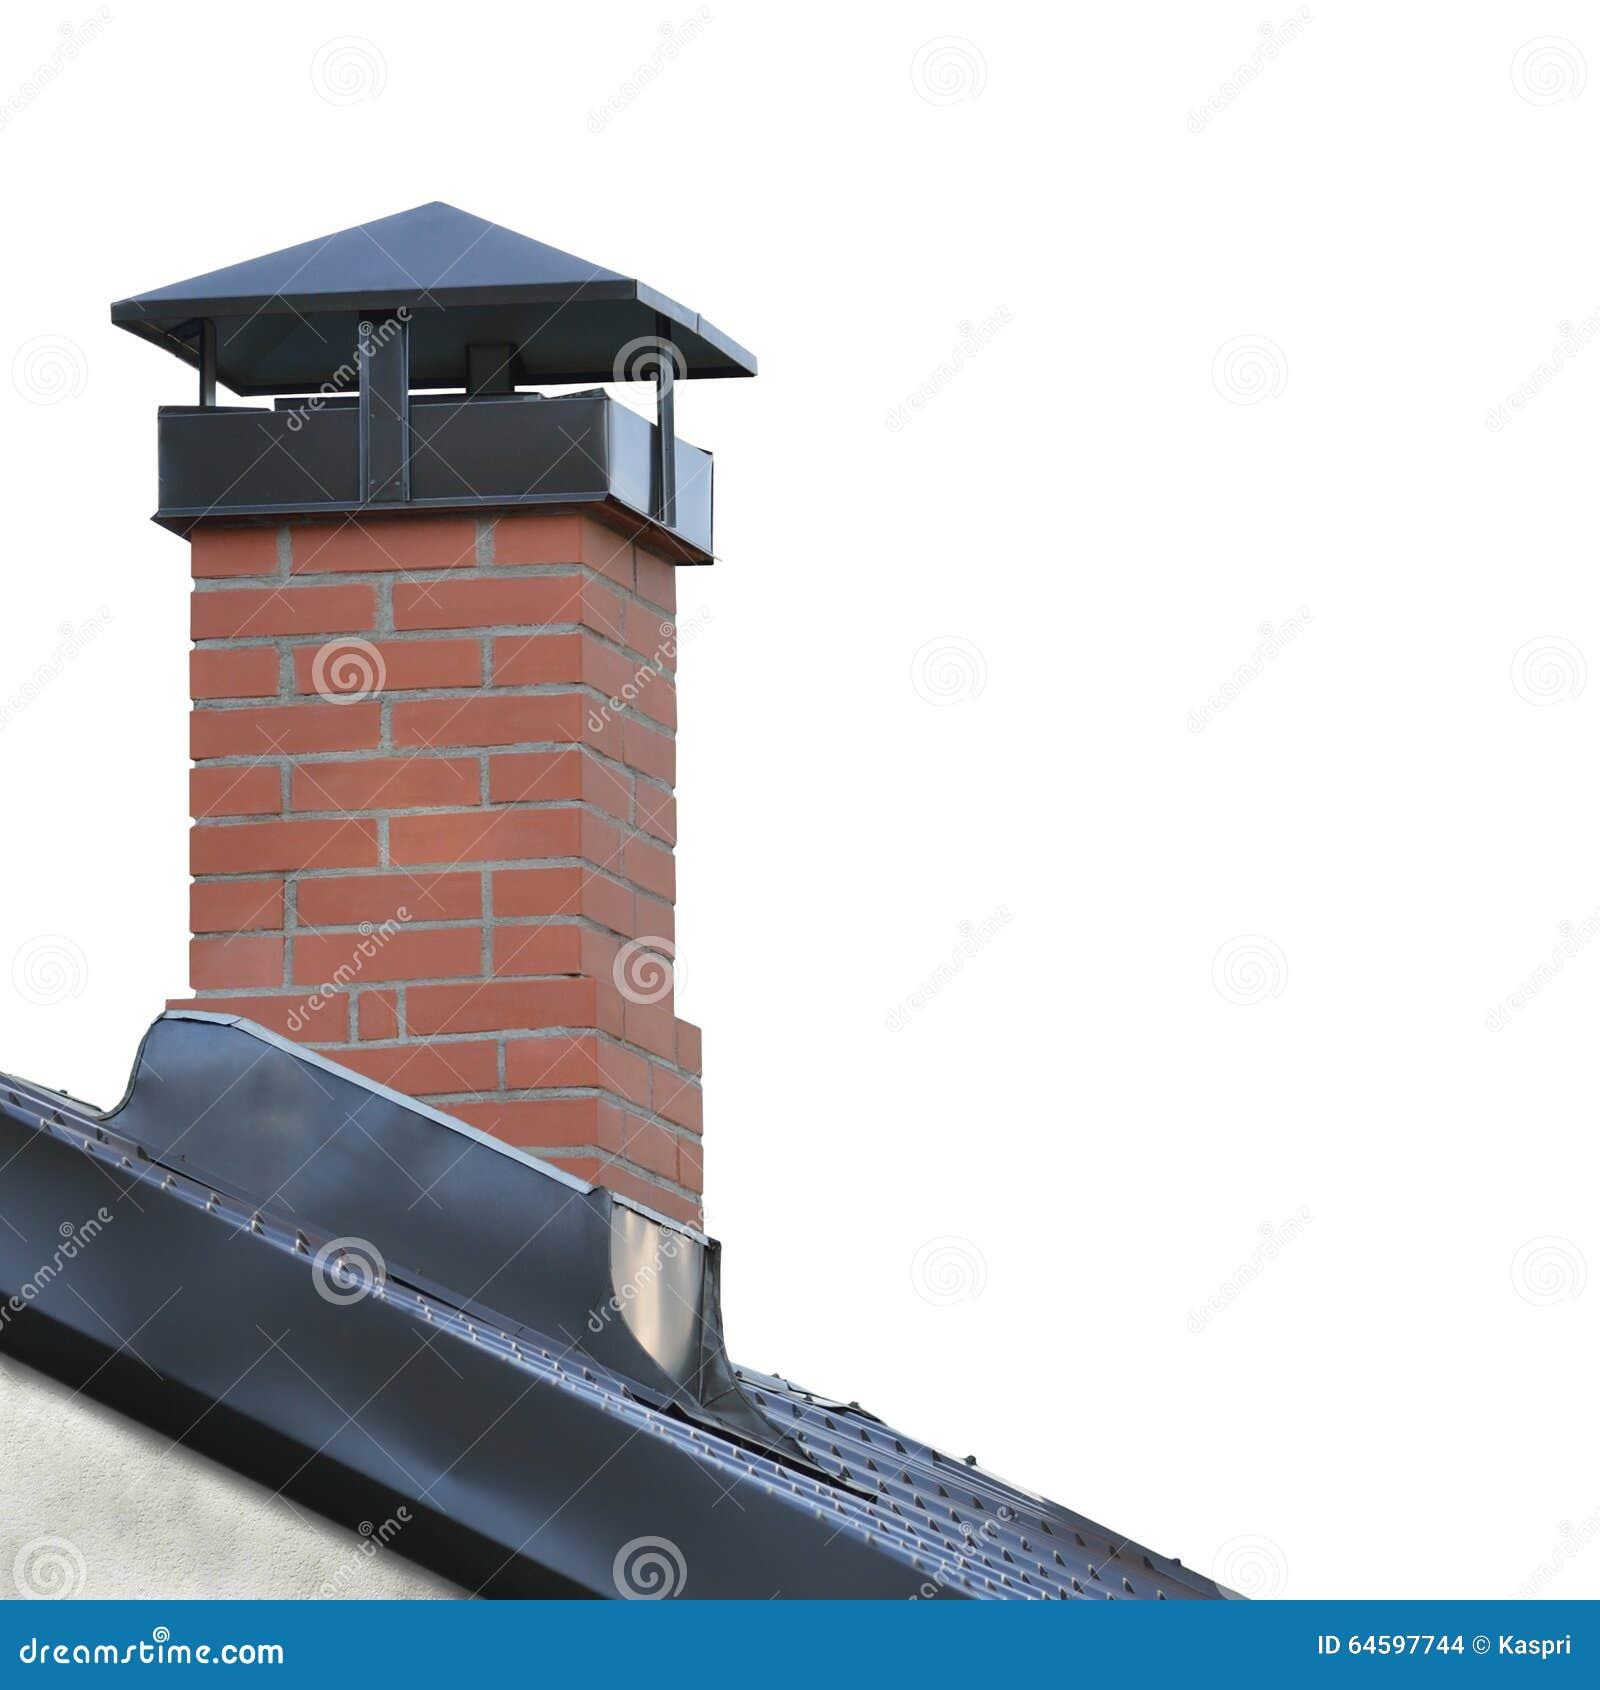 Chaminé do tijolo vermelho, Grey Steel Tile Roof Texture, Gray Tiled Roofing, grande close up vertical isolado detalhado, residen